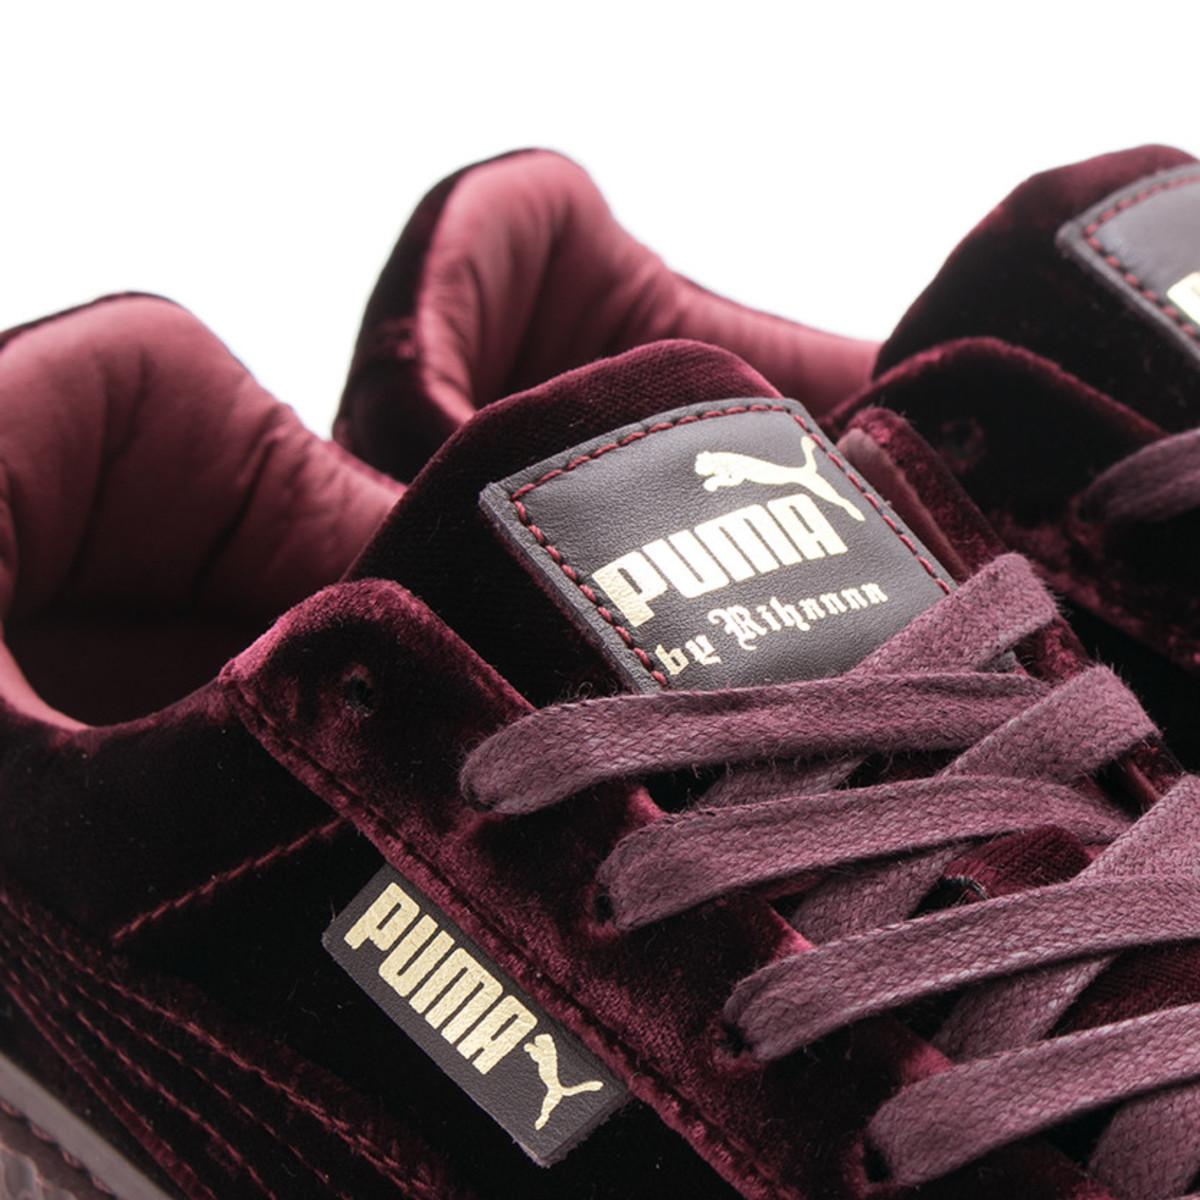 Puma Womens Fenty Creeper Velvet Burgundy Garmentory Maroon No Brand Info